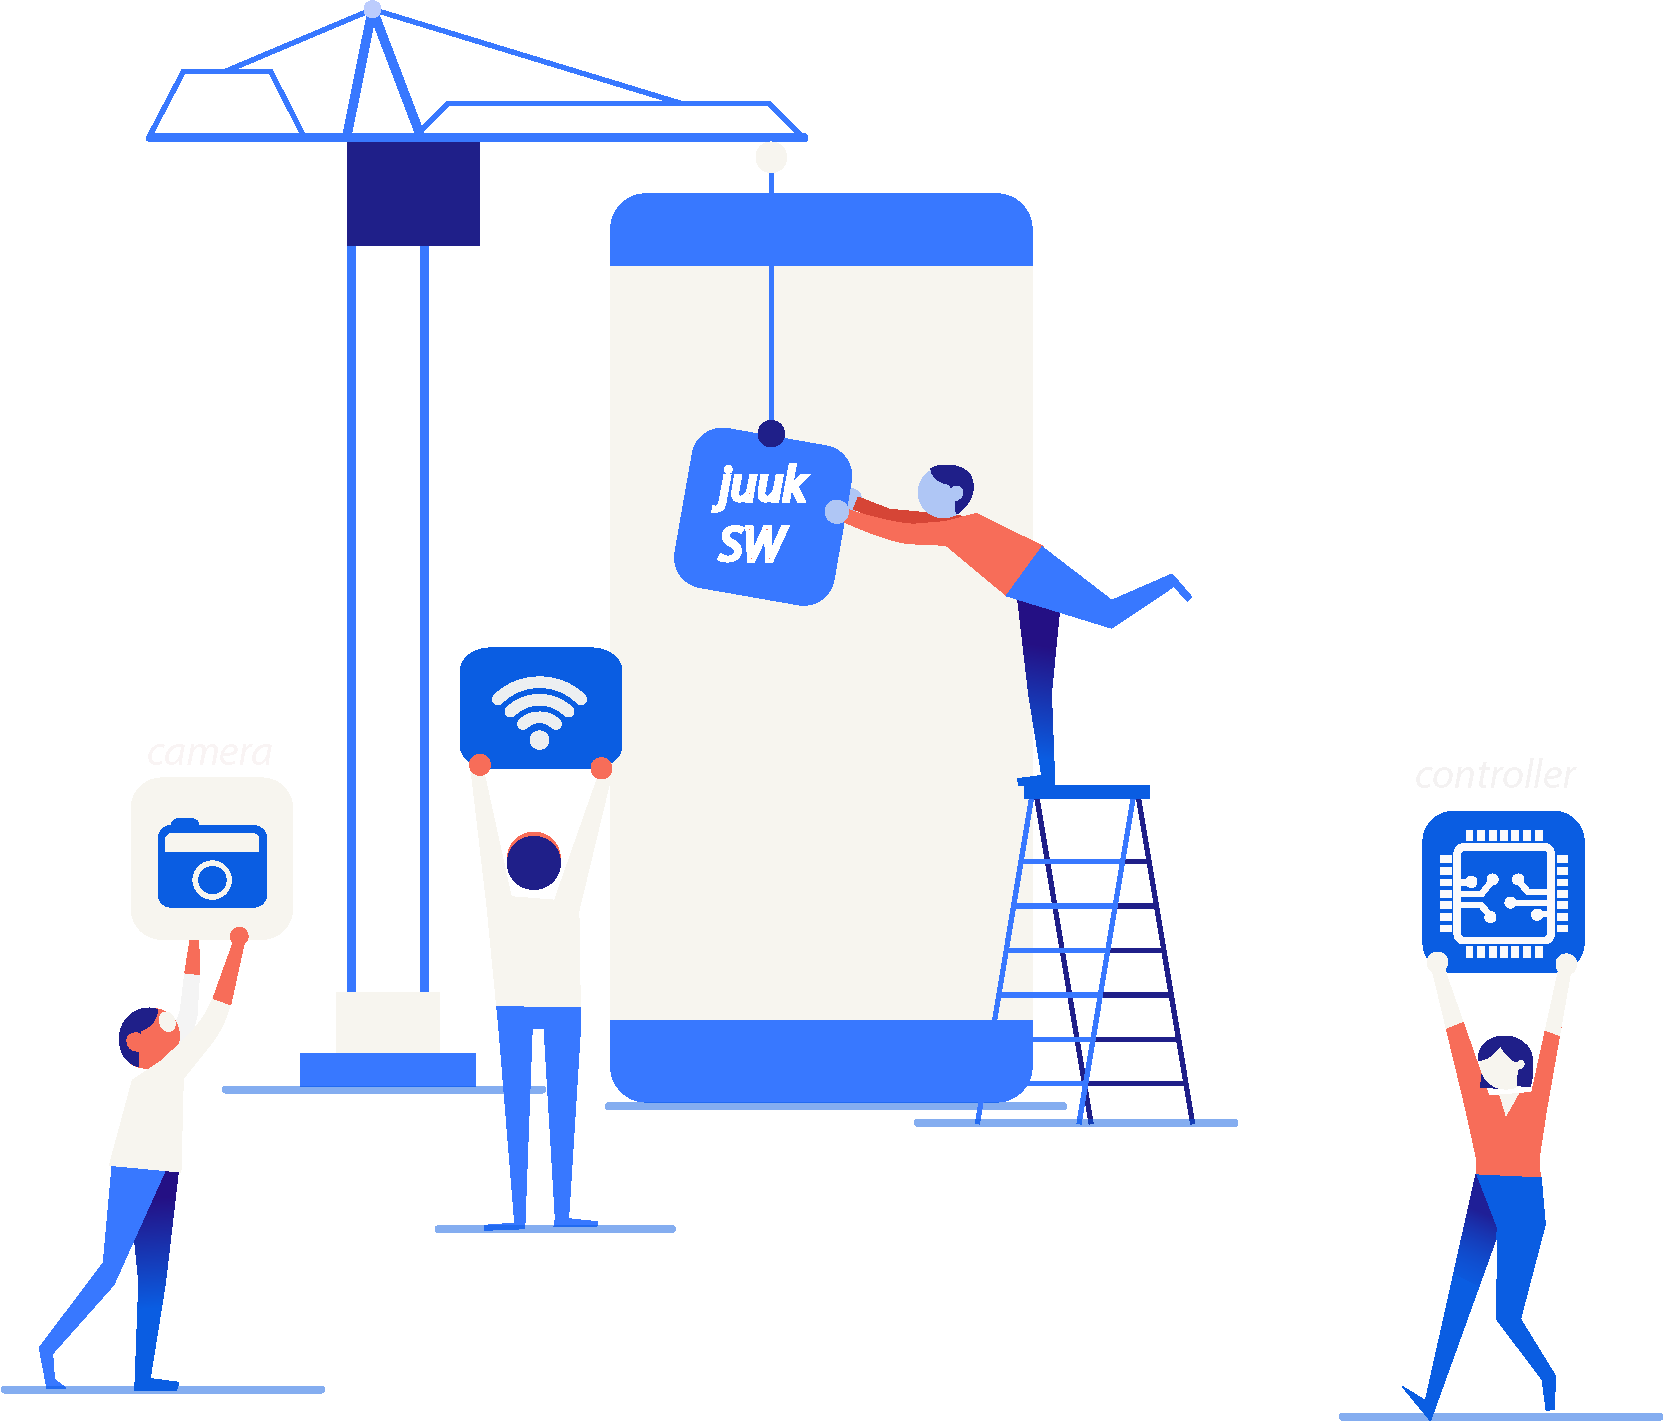 Juuk's software stack illustration, artwork by freepik.